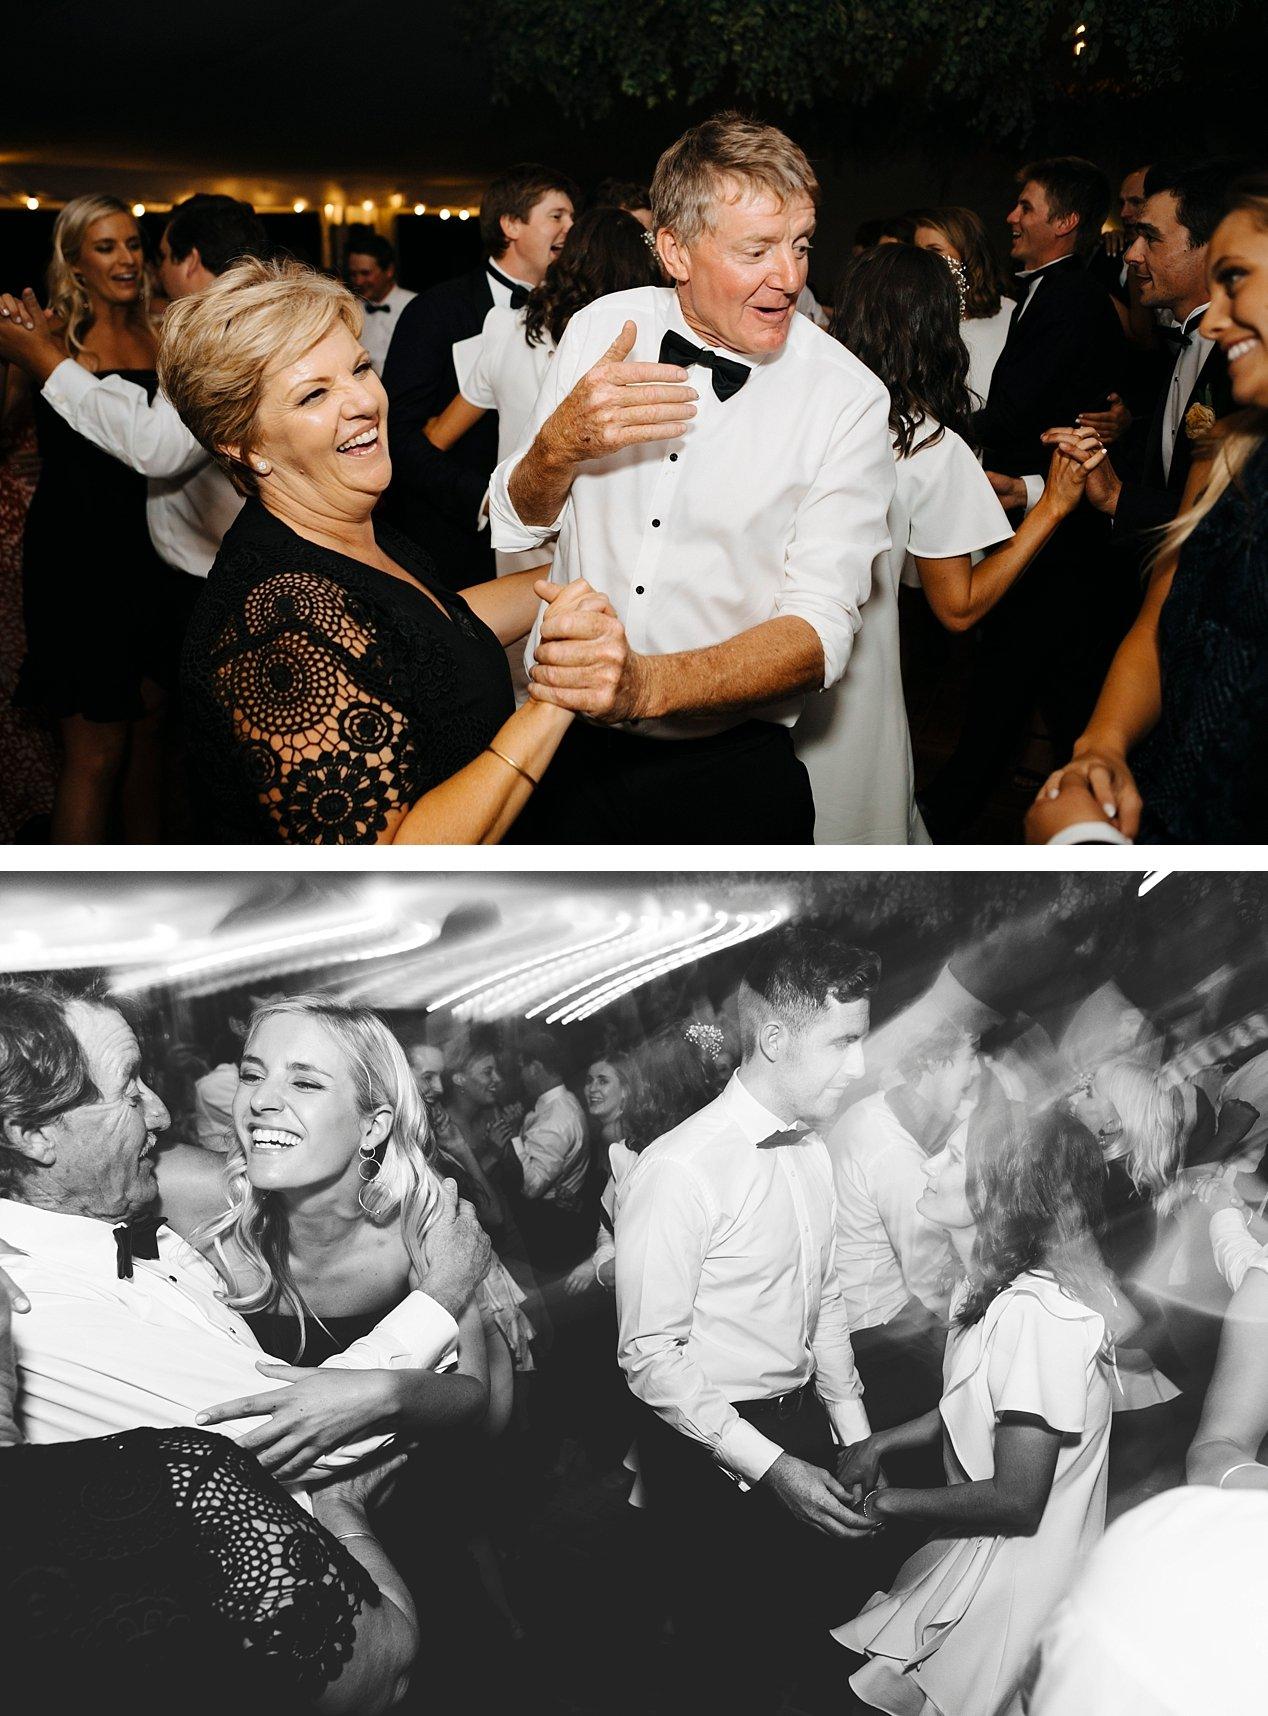 Deniliquin Jerilderie Wagga Wagga Wedding Photographer_The Crossing Deniliquin party caterers Deniliquin8